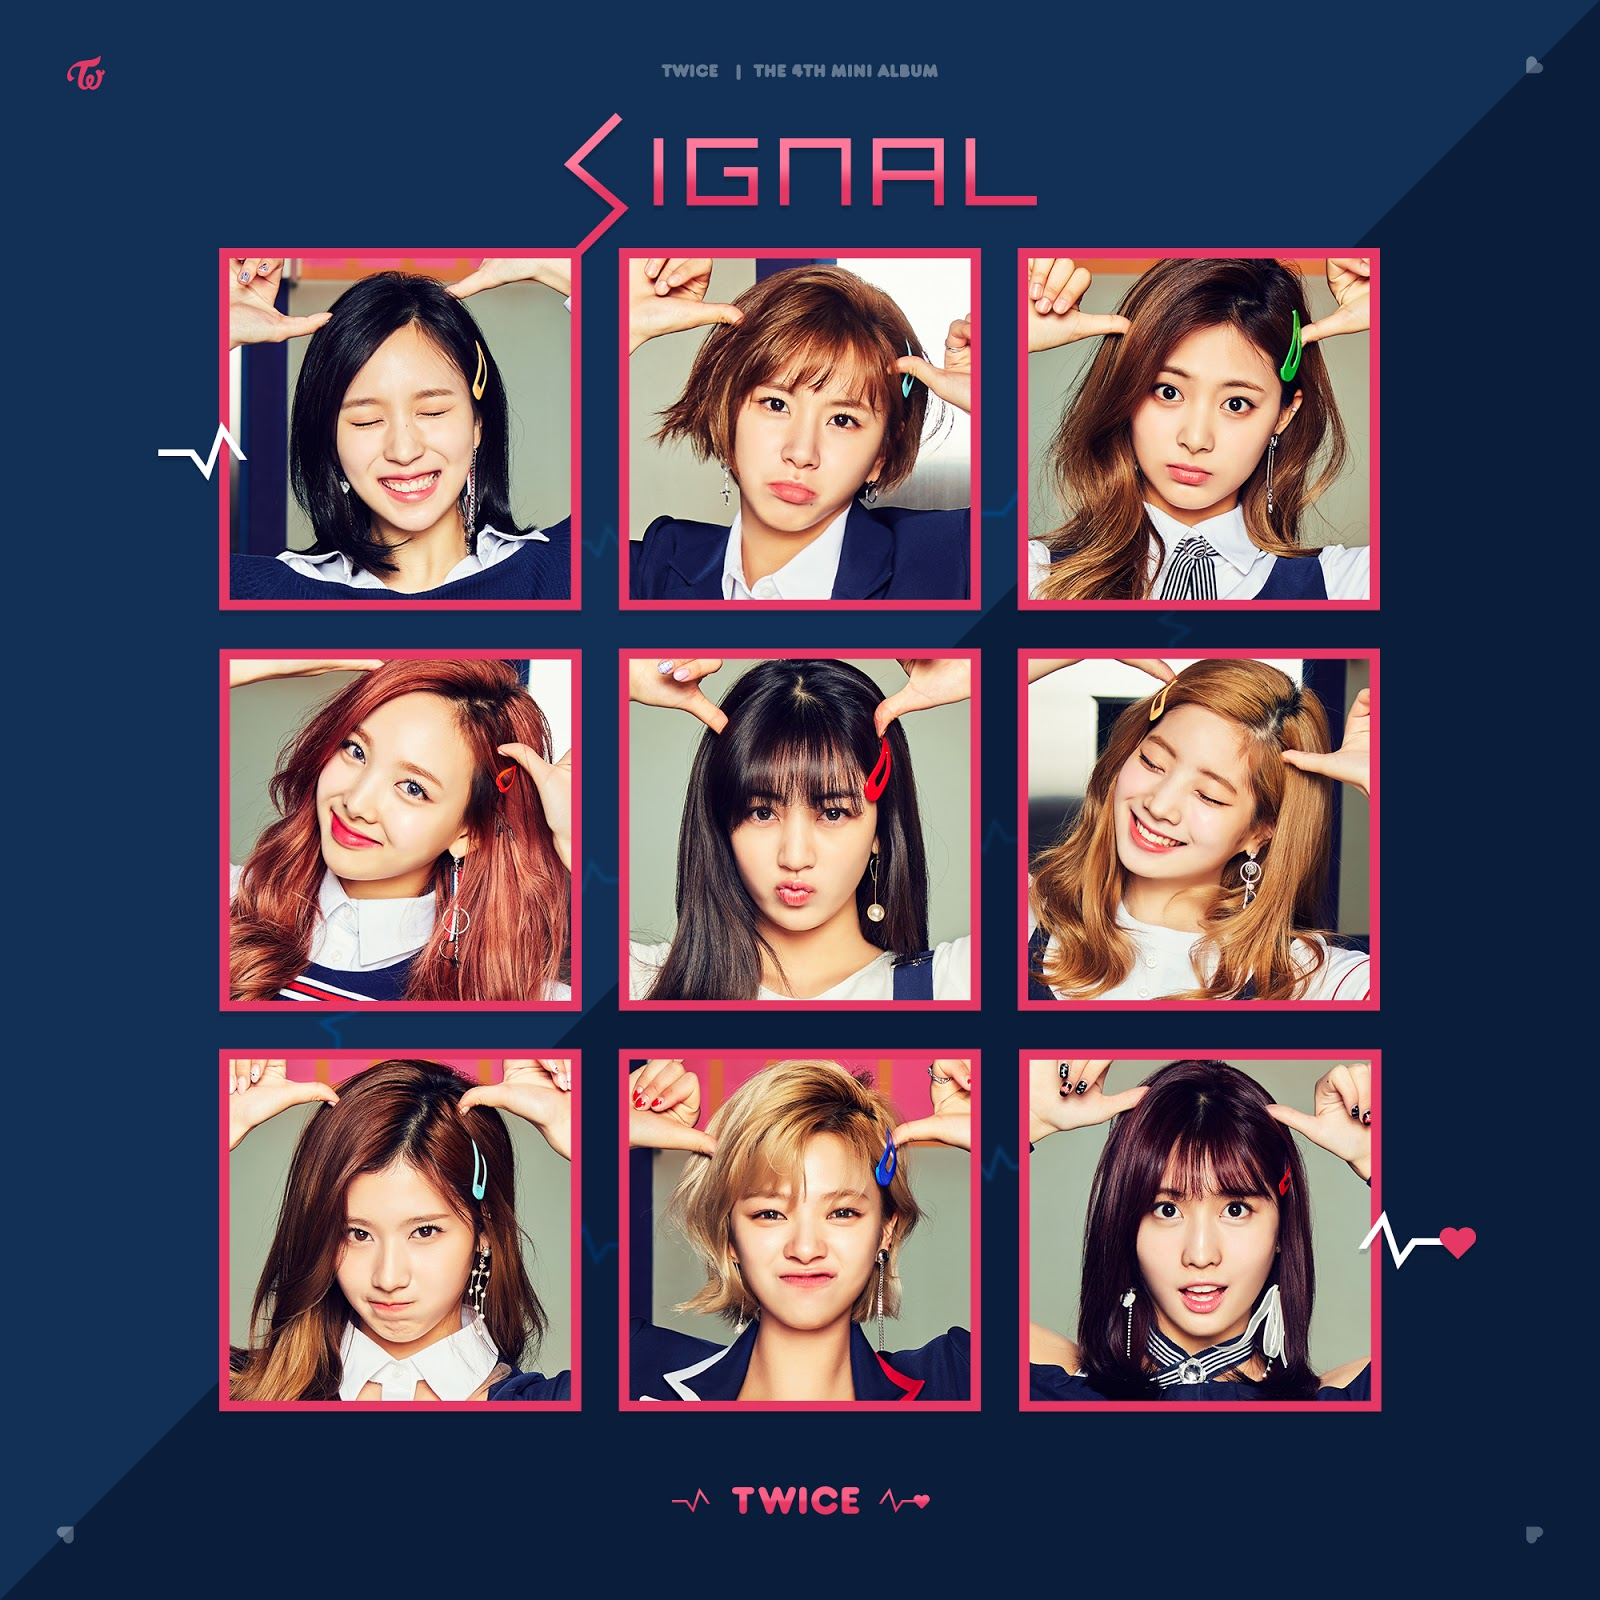 TWICE - SOMEONE LIKE ME [Easy-Lyrics | ENG] - Korean Song